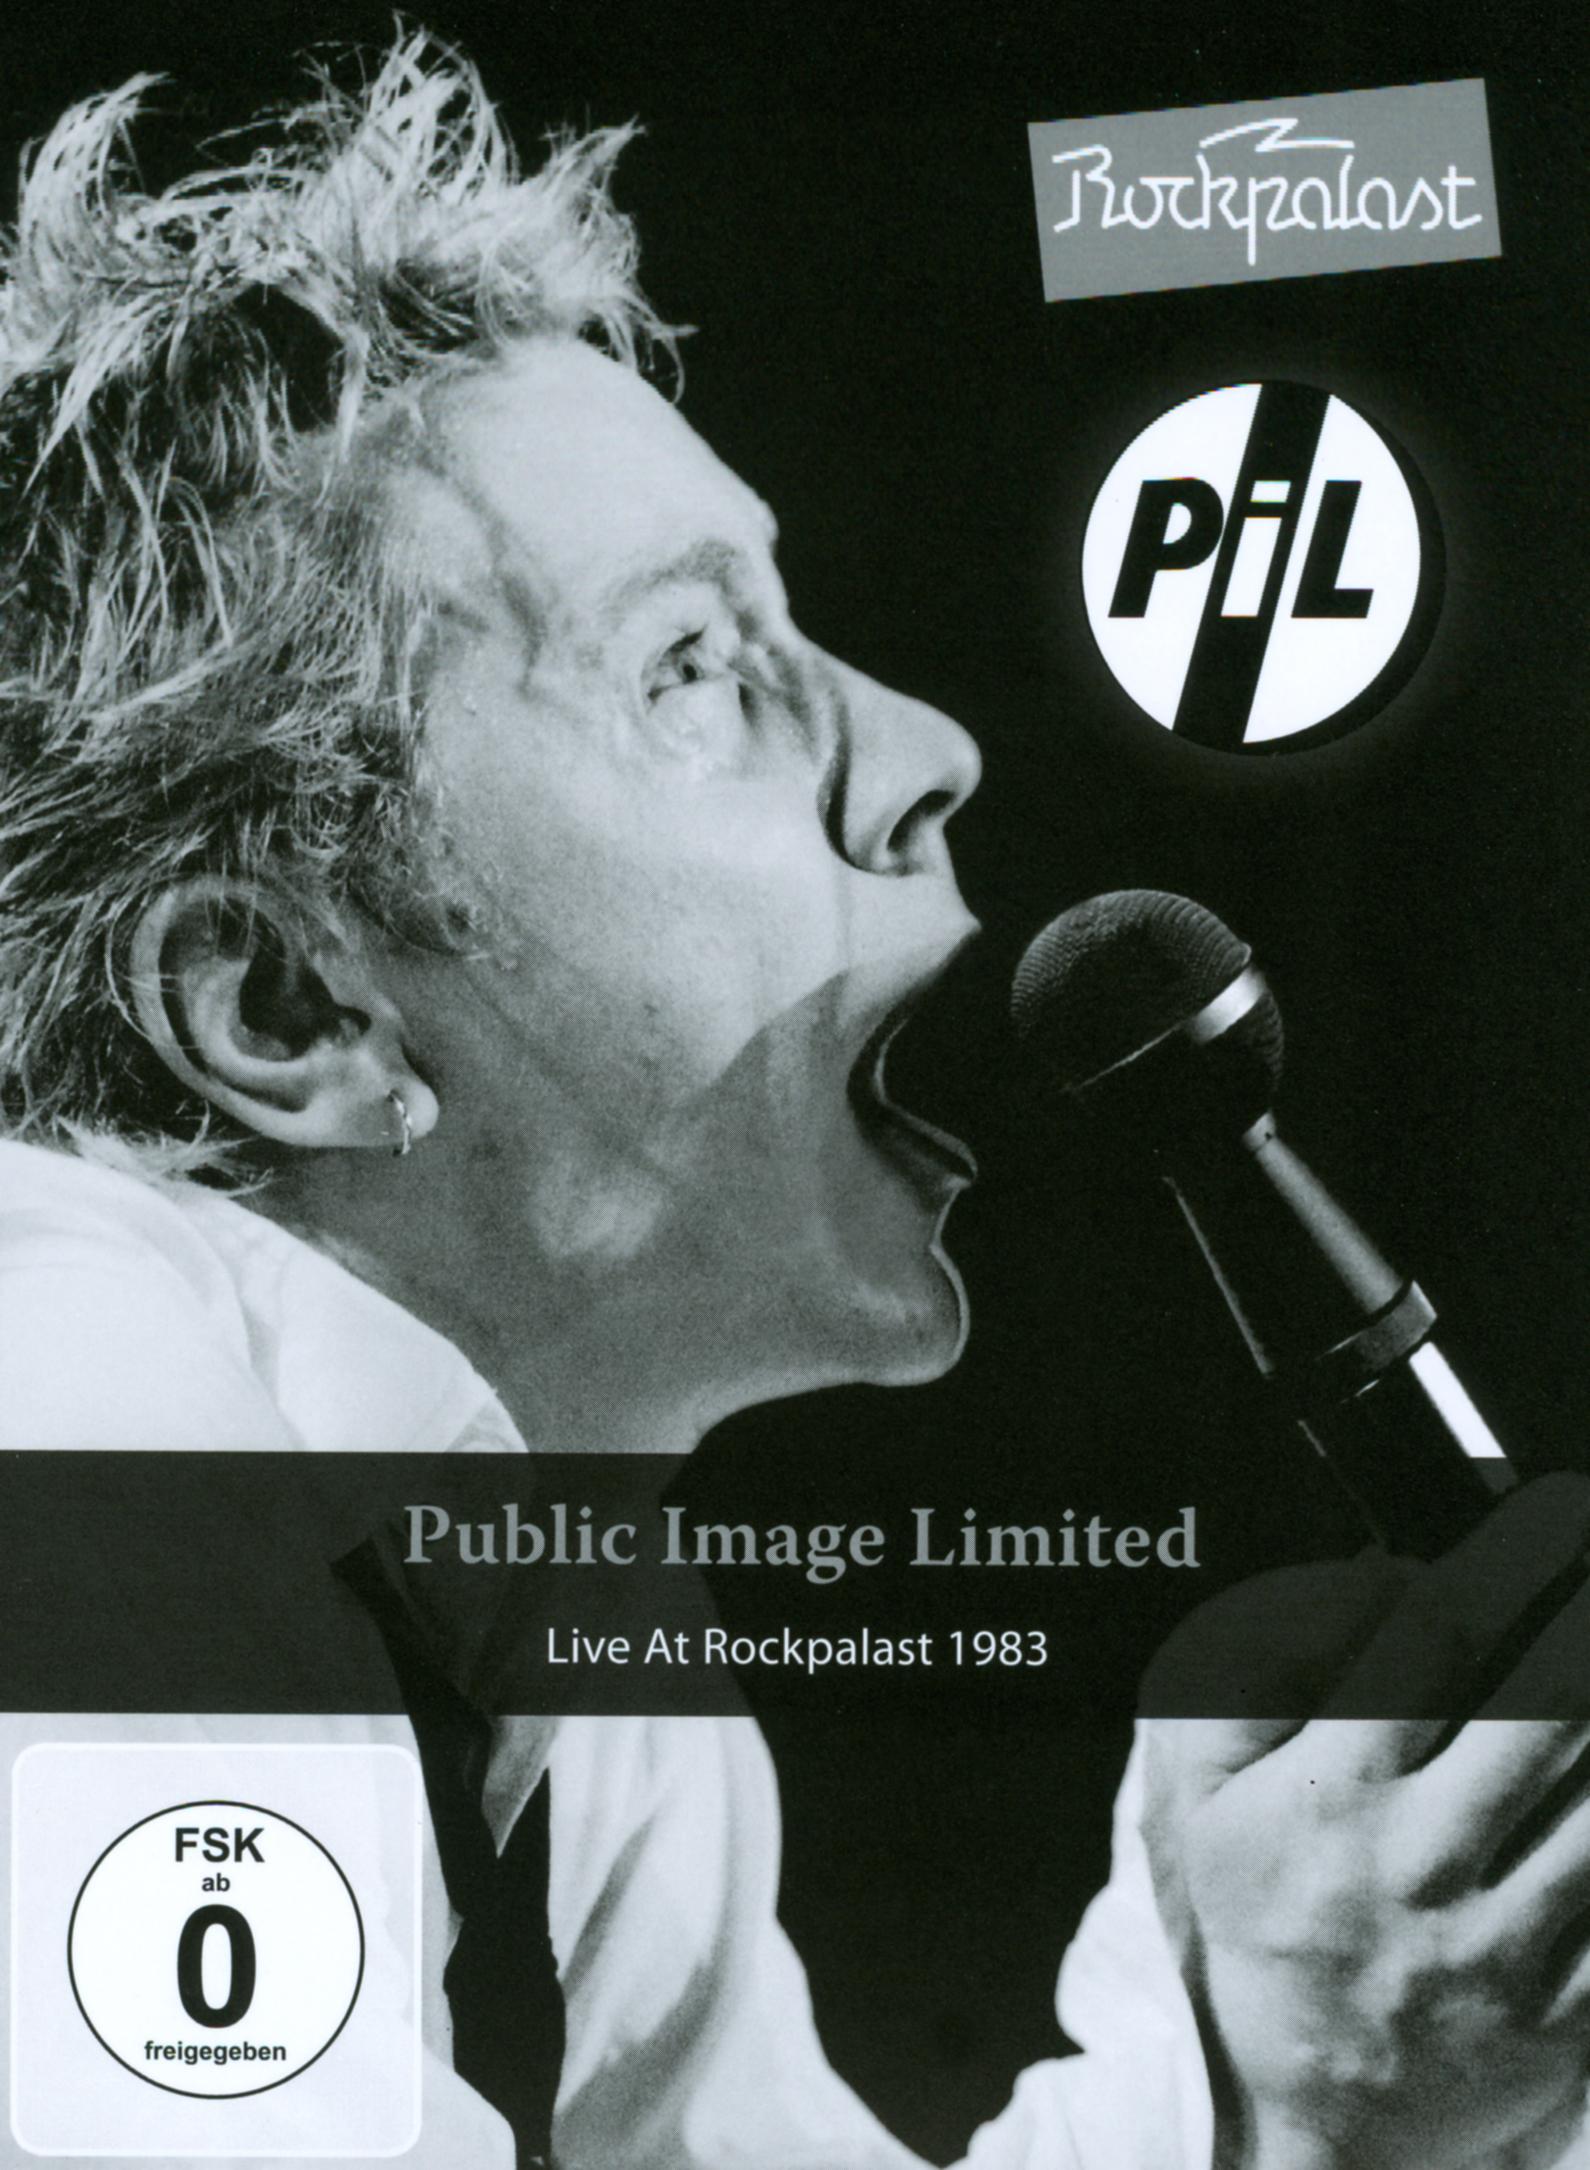 Rockpalast: Public Image Limited